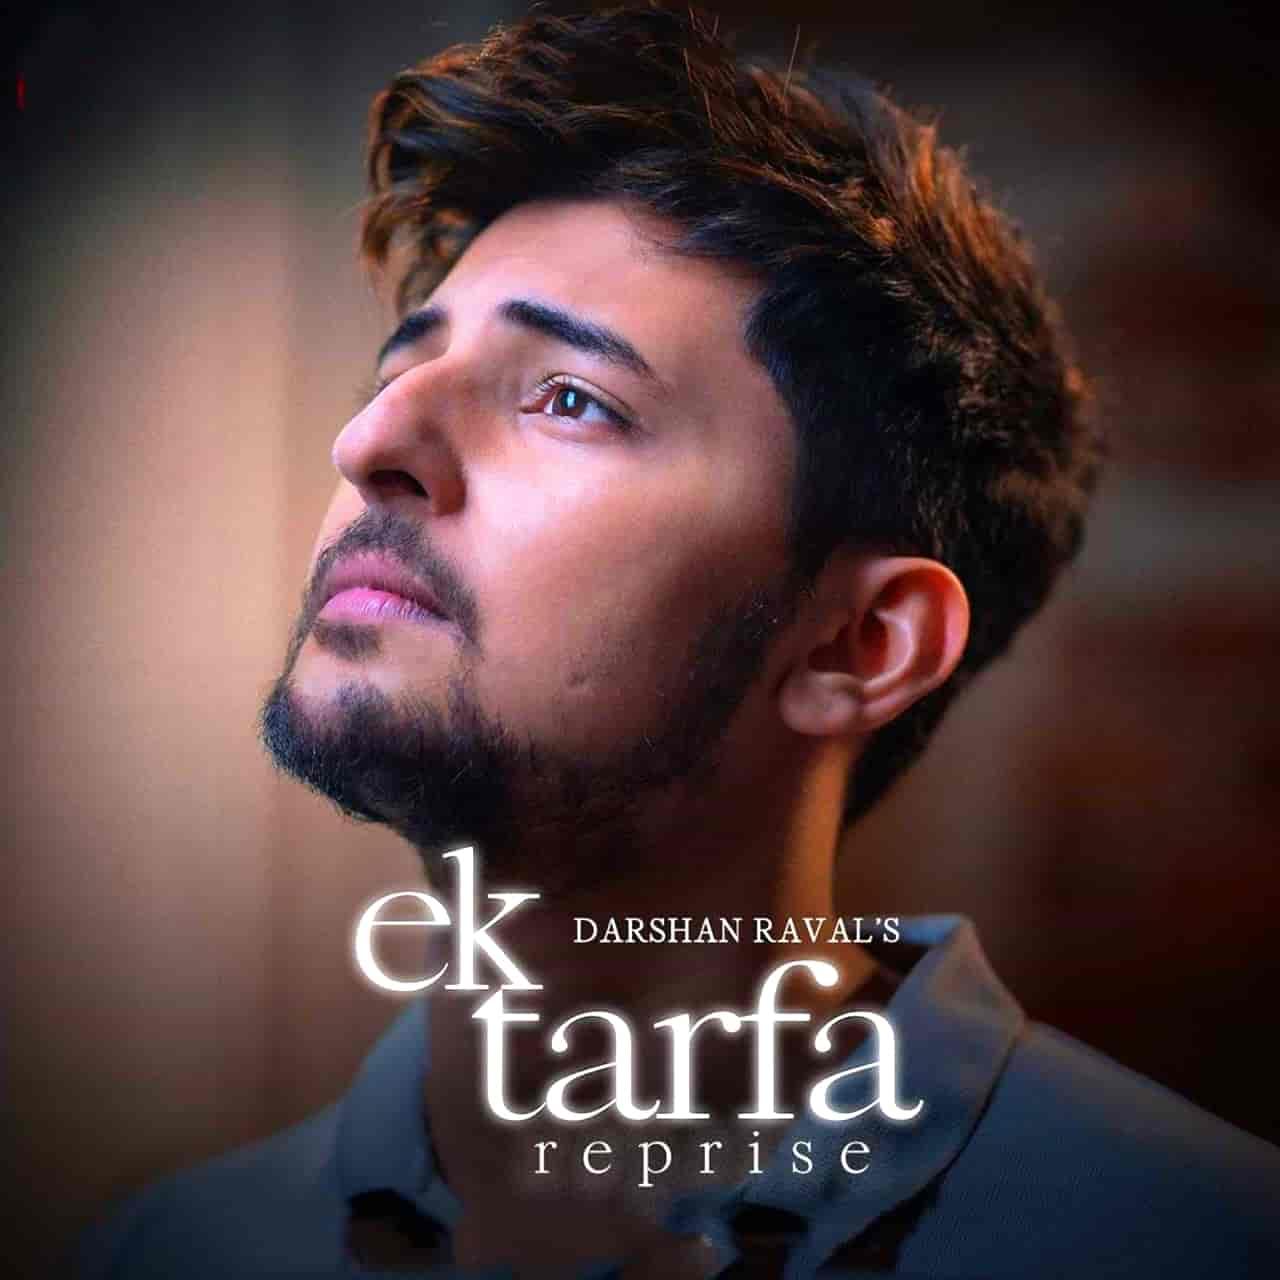 Ek Tarfa Reprise Love Hindi Song Image By Darshan Raval